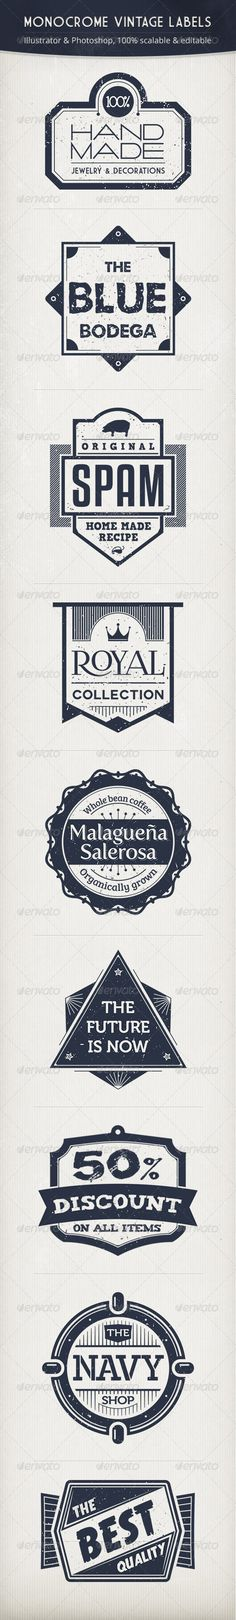 Monochrome Vintage Labels | typography